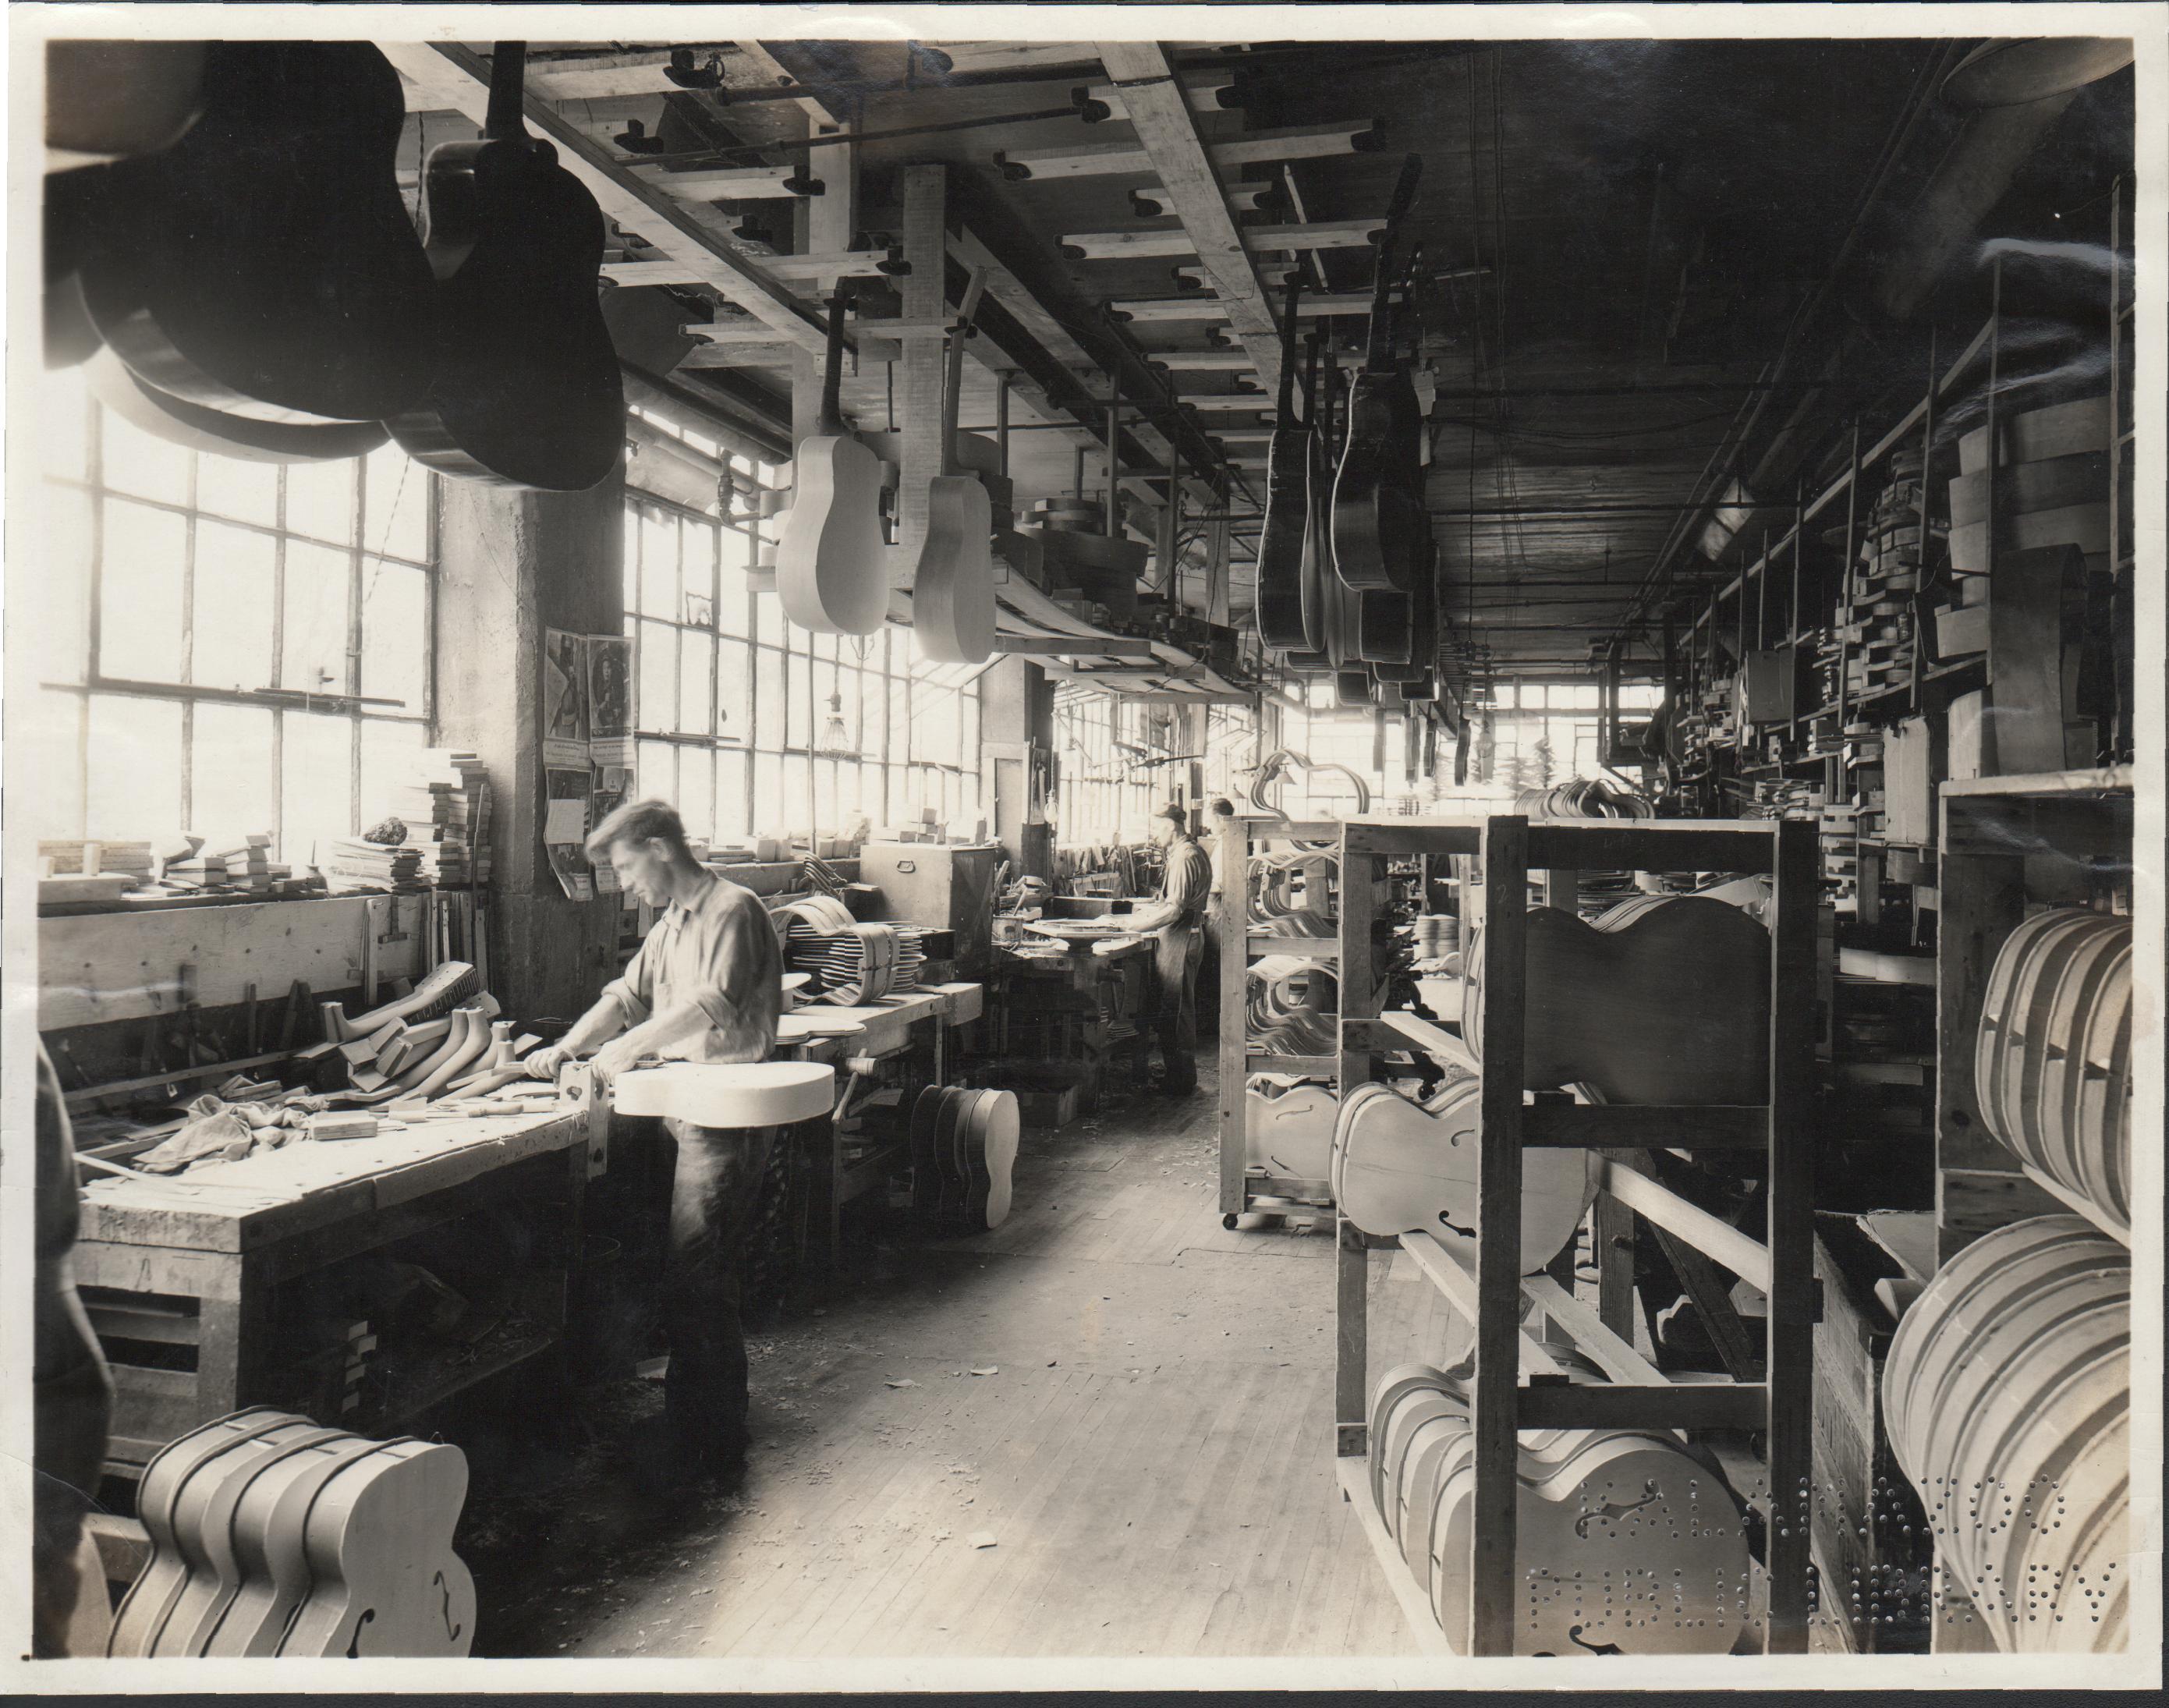 Gibson, Inc., Interior, 1936 Source: Kalamazoo Public Library Photograph P-79